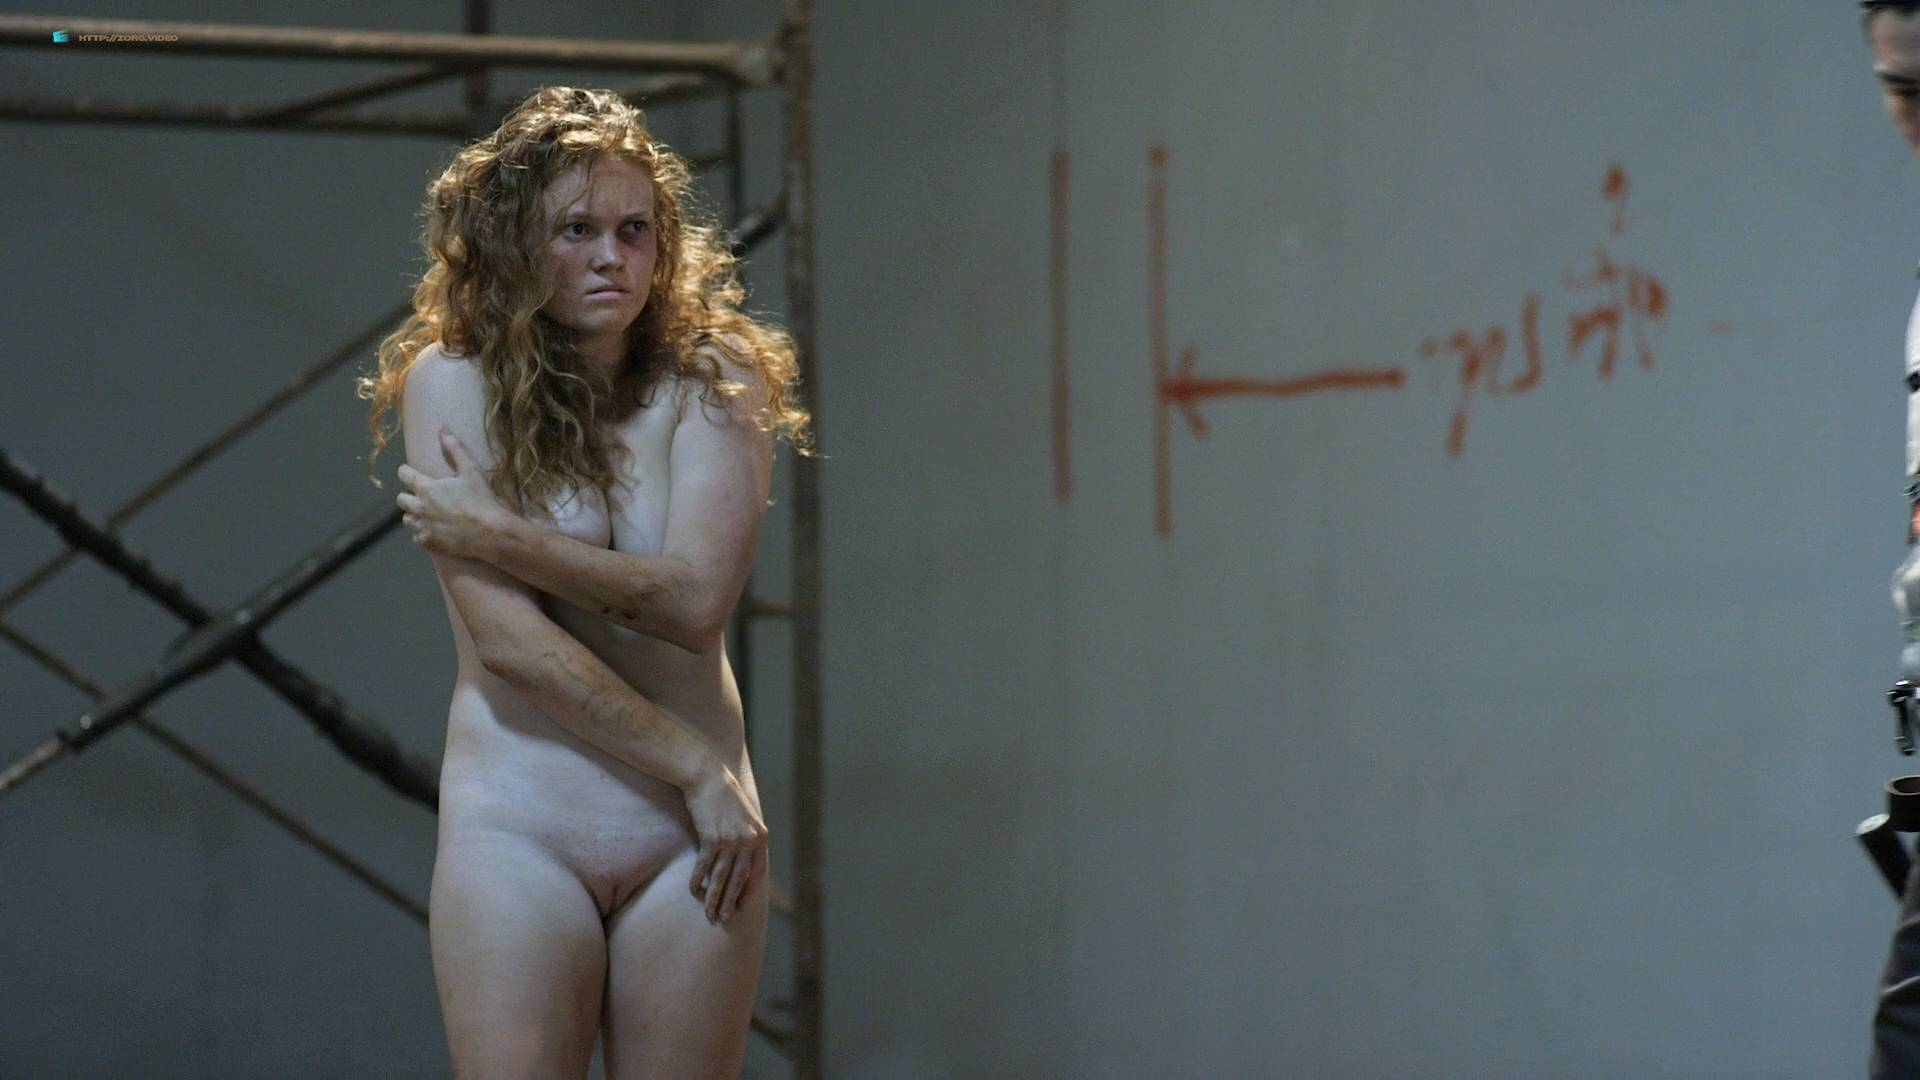 Kelly-McCart-nude-full-frontal-Katrina-Grey-nude-lesbian-sex-Locked-Up-2017-HD-1080p-Web-009.jpg